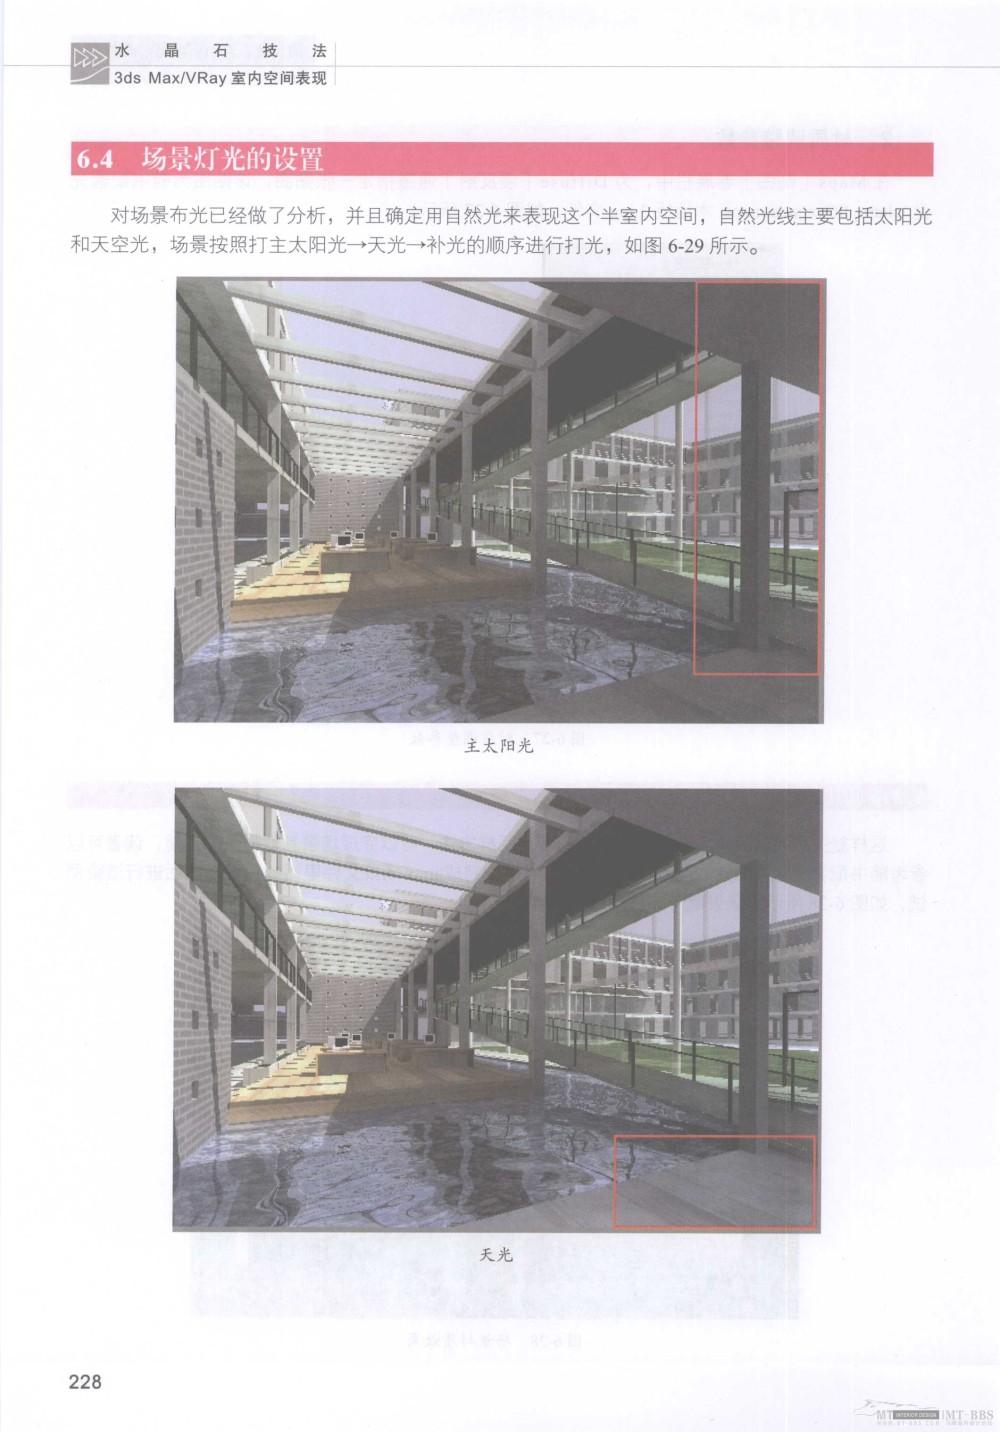 水晶石技法-3ds_Max&VRay室内空间表现_水晶石技法-3ds_Max&VRay室内空间表现_页面_234.jpg